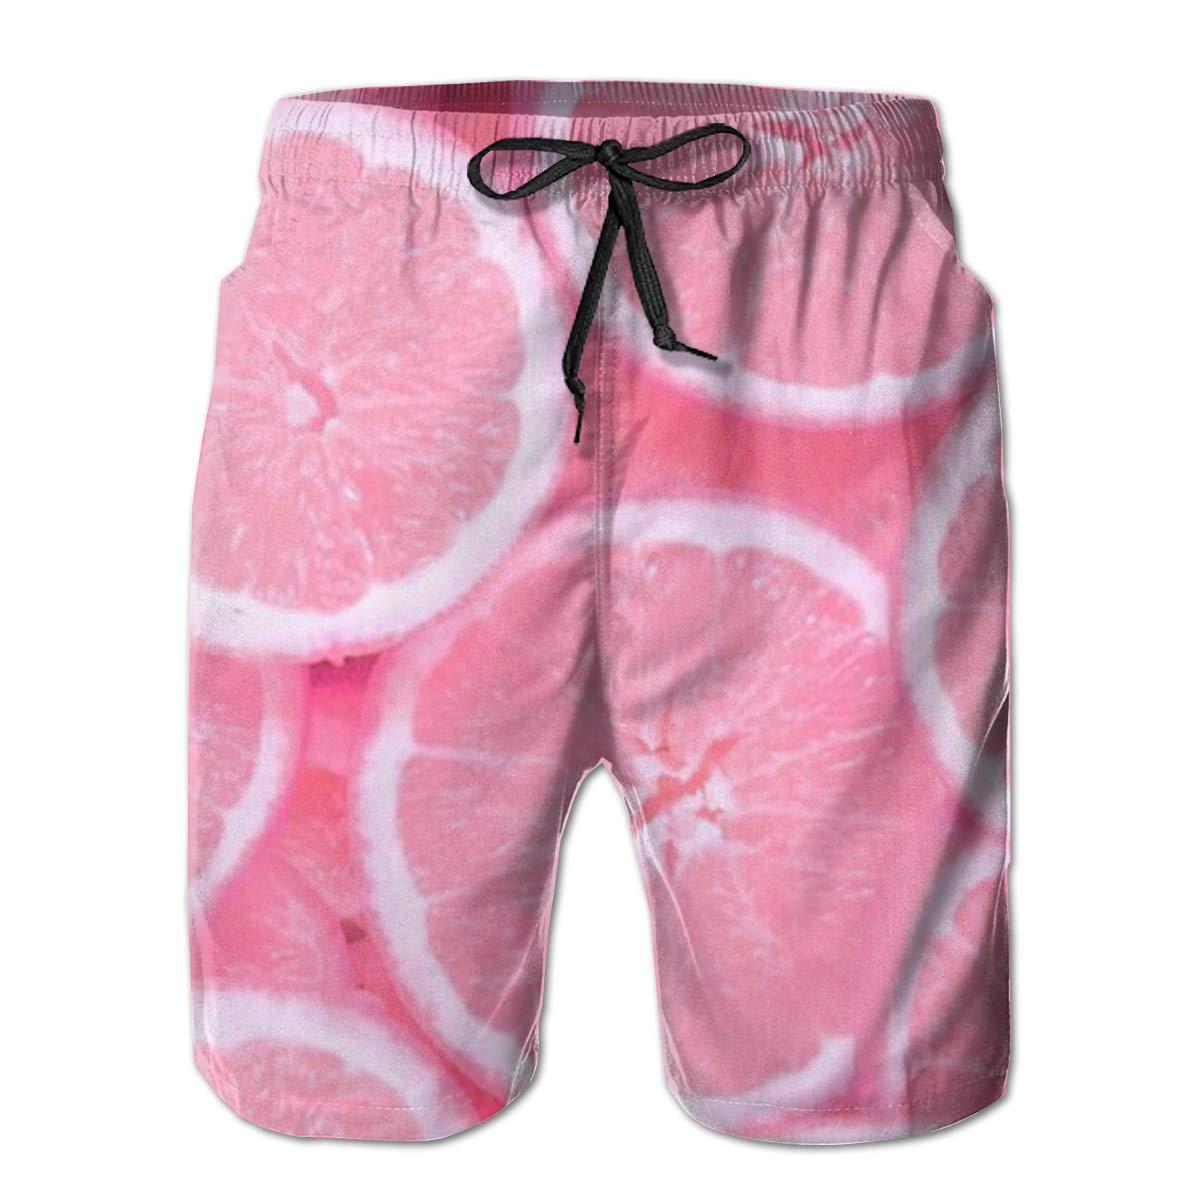 Mens Lemon Slices Summer Holiday Quick-Drying Swim Trunks Beach Shorts Board Shorts